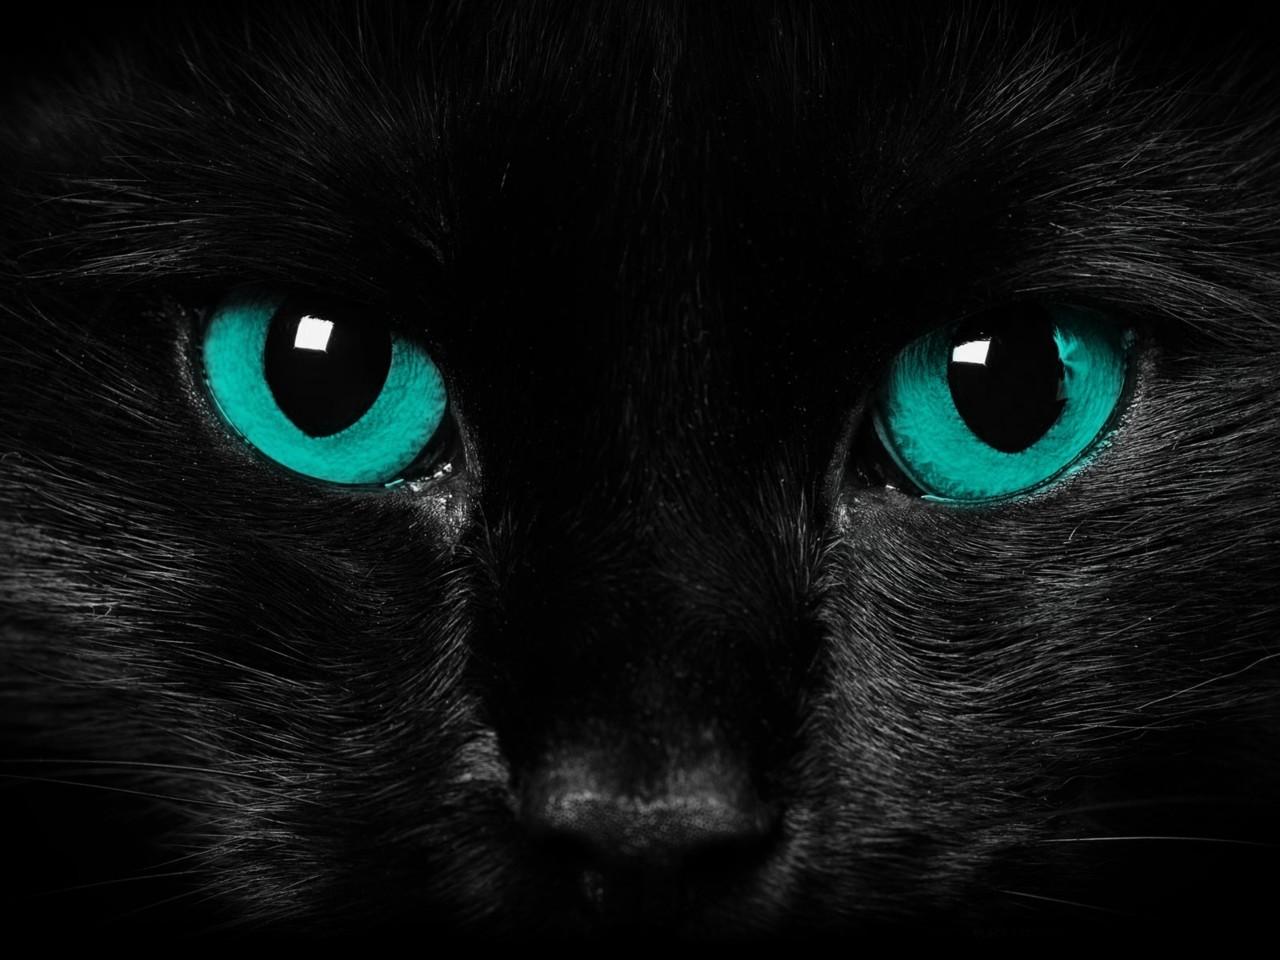 Black Cat Blue Eyes Cat Wallpaper Black Cat Blue Eyes 1280x960 Download Hd Wallpaper Wallpapertip